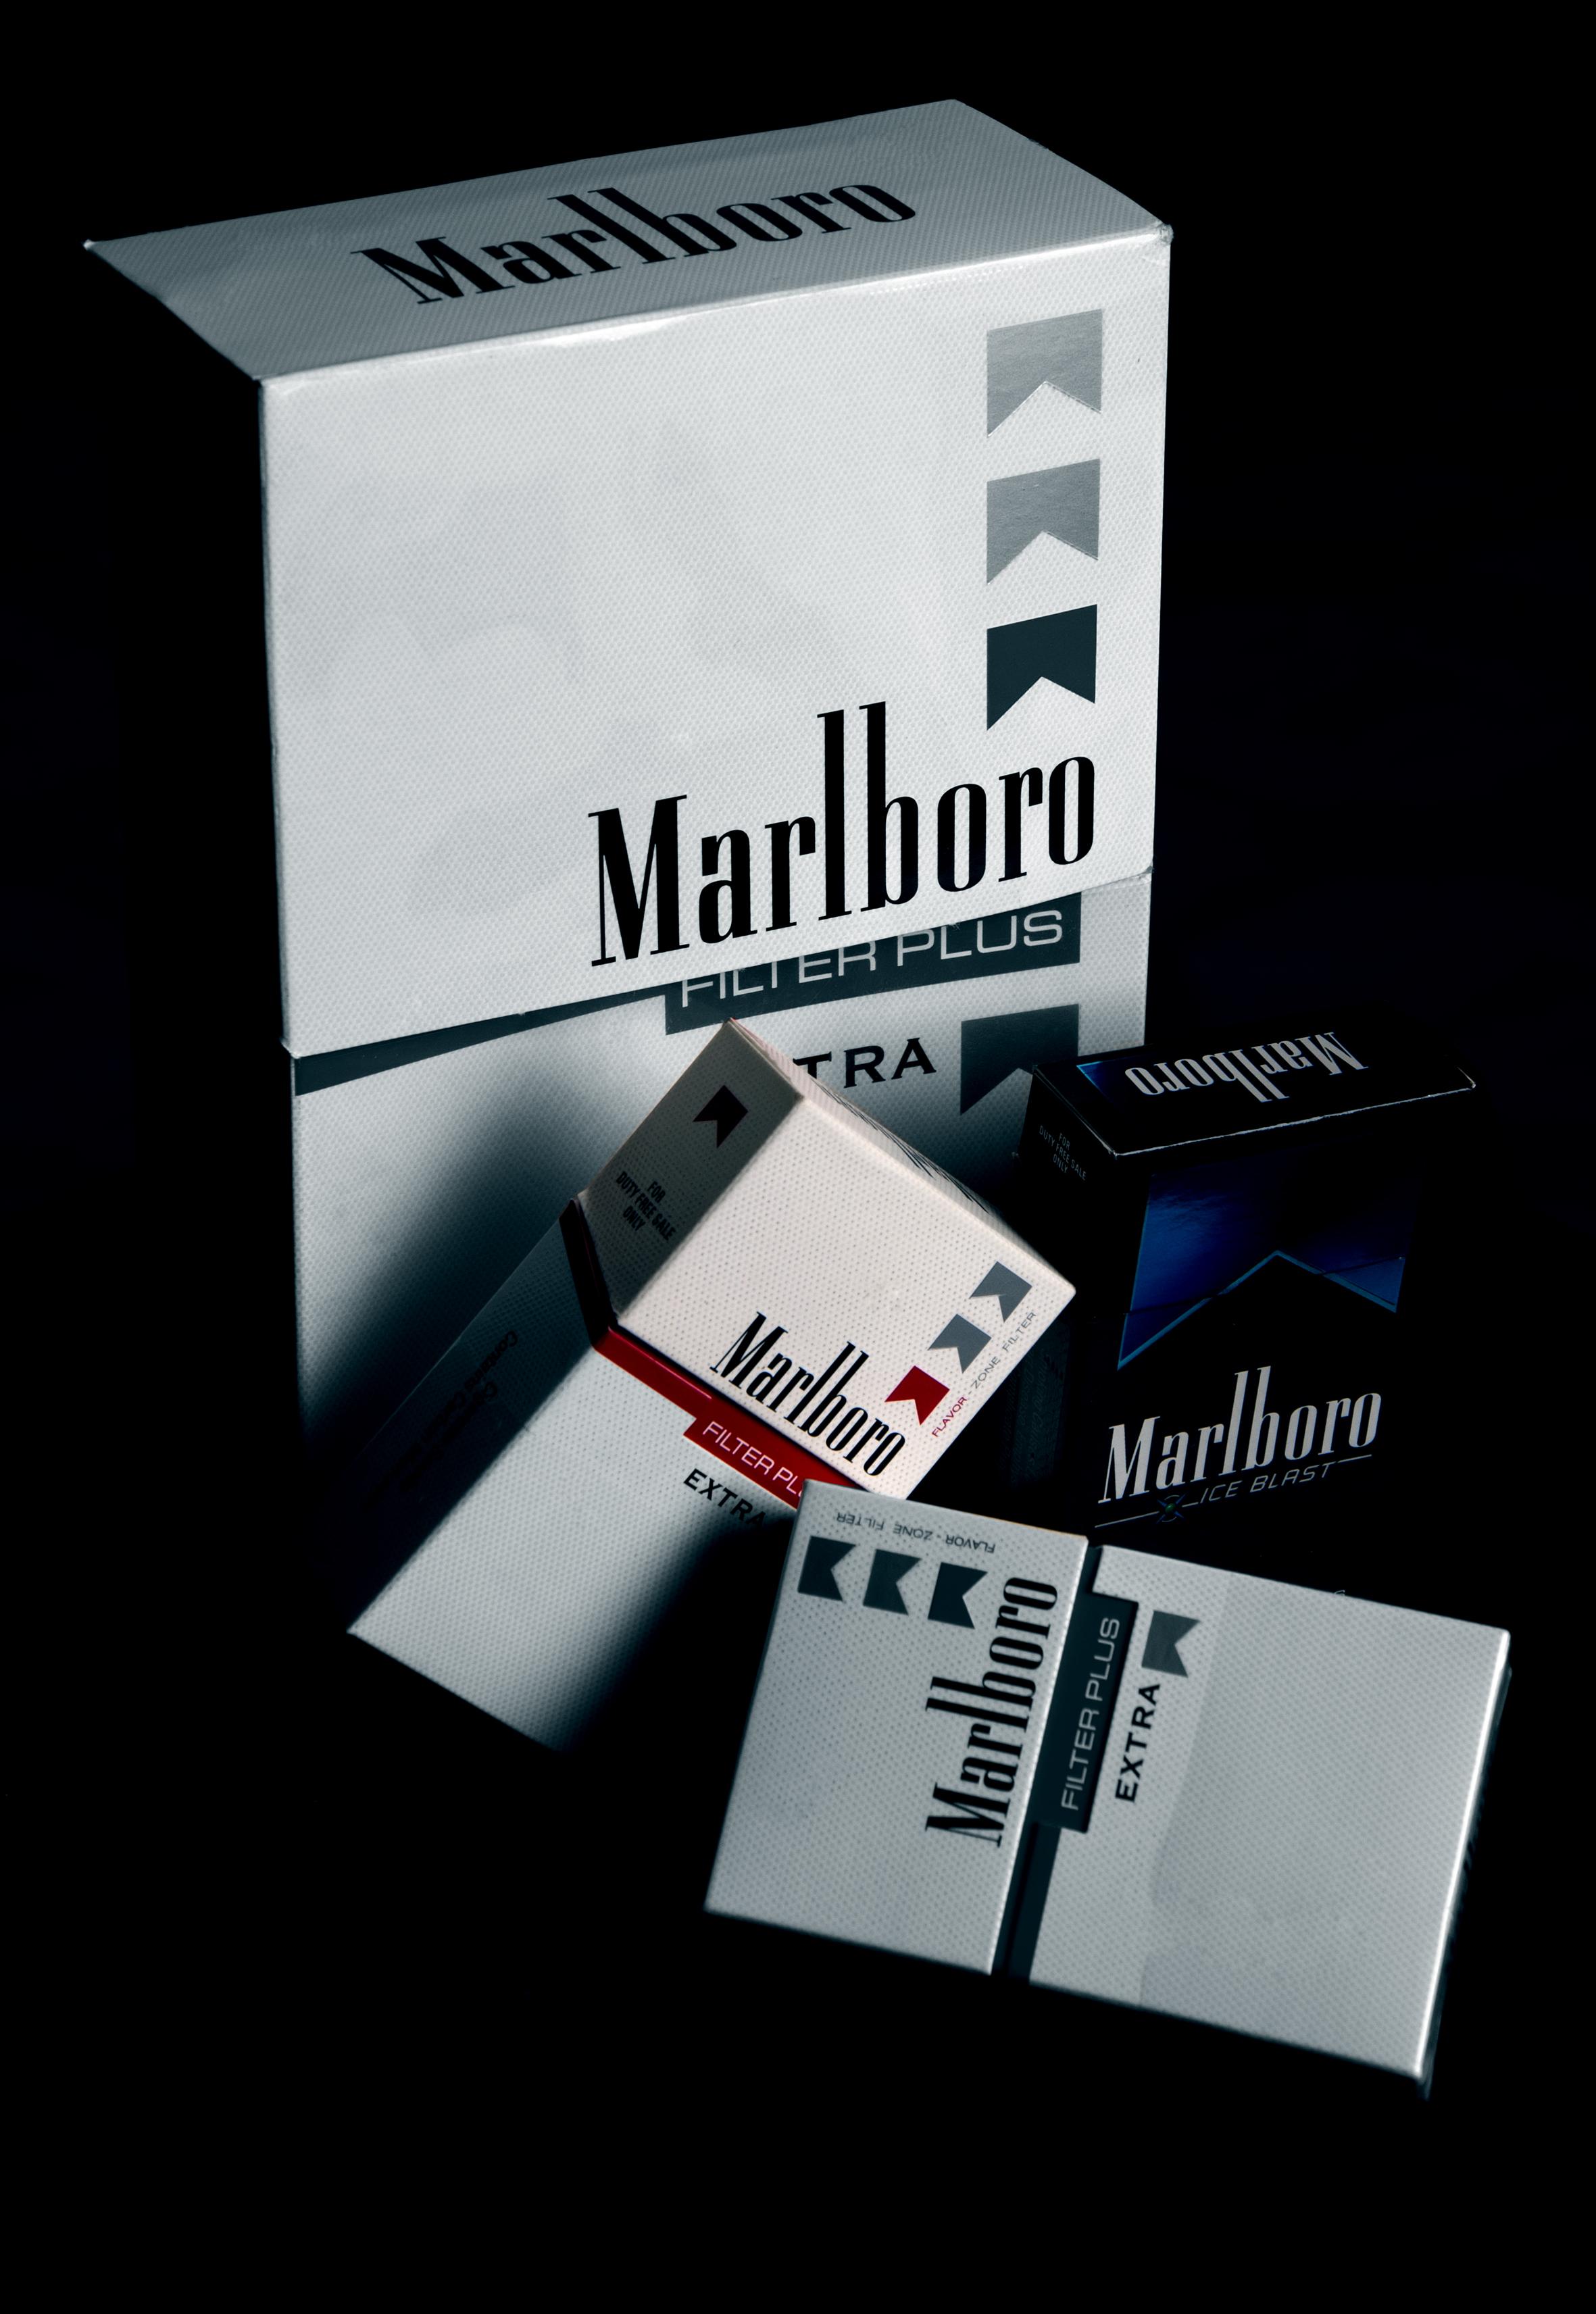 Best Iphone X Wallpaper Free Stock Photo Of Cigar Cigarette Smoker